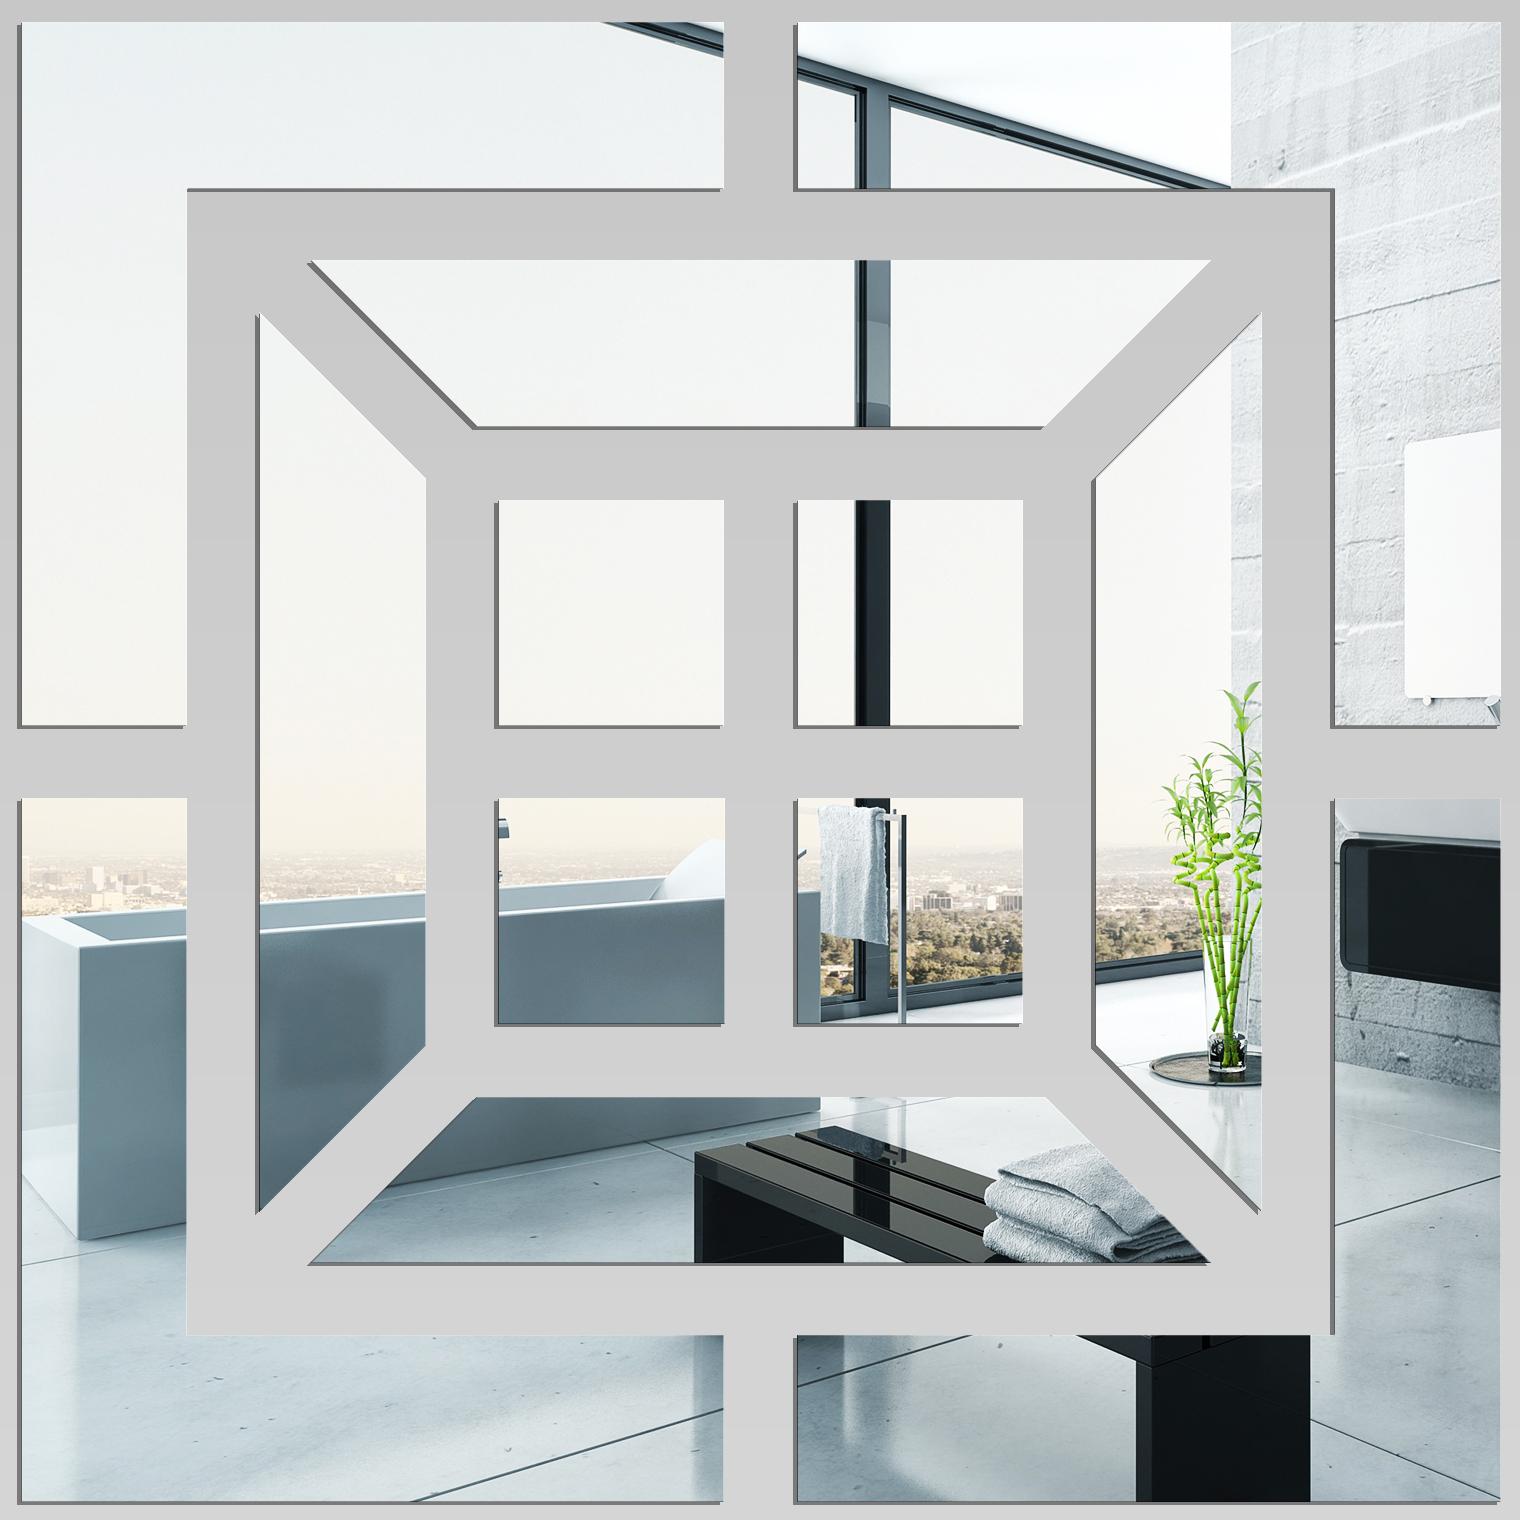 miroir plexiglass acrylique carr 2 pas cher